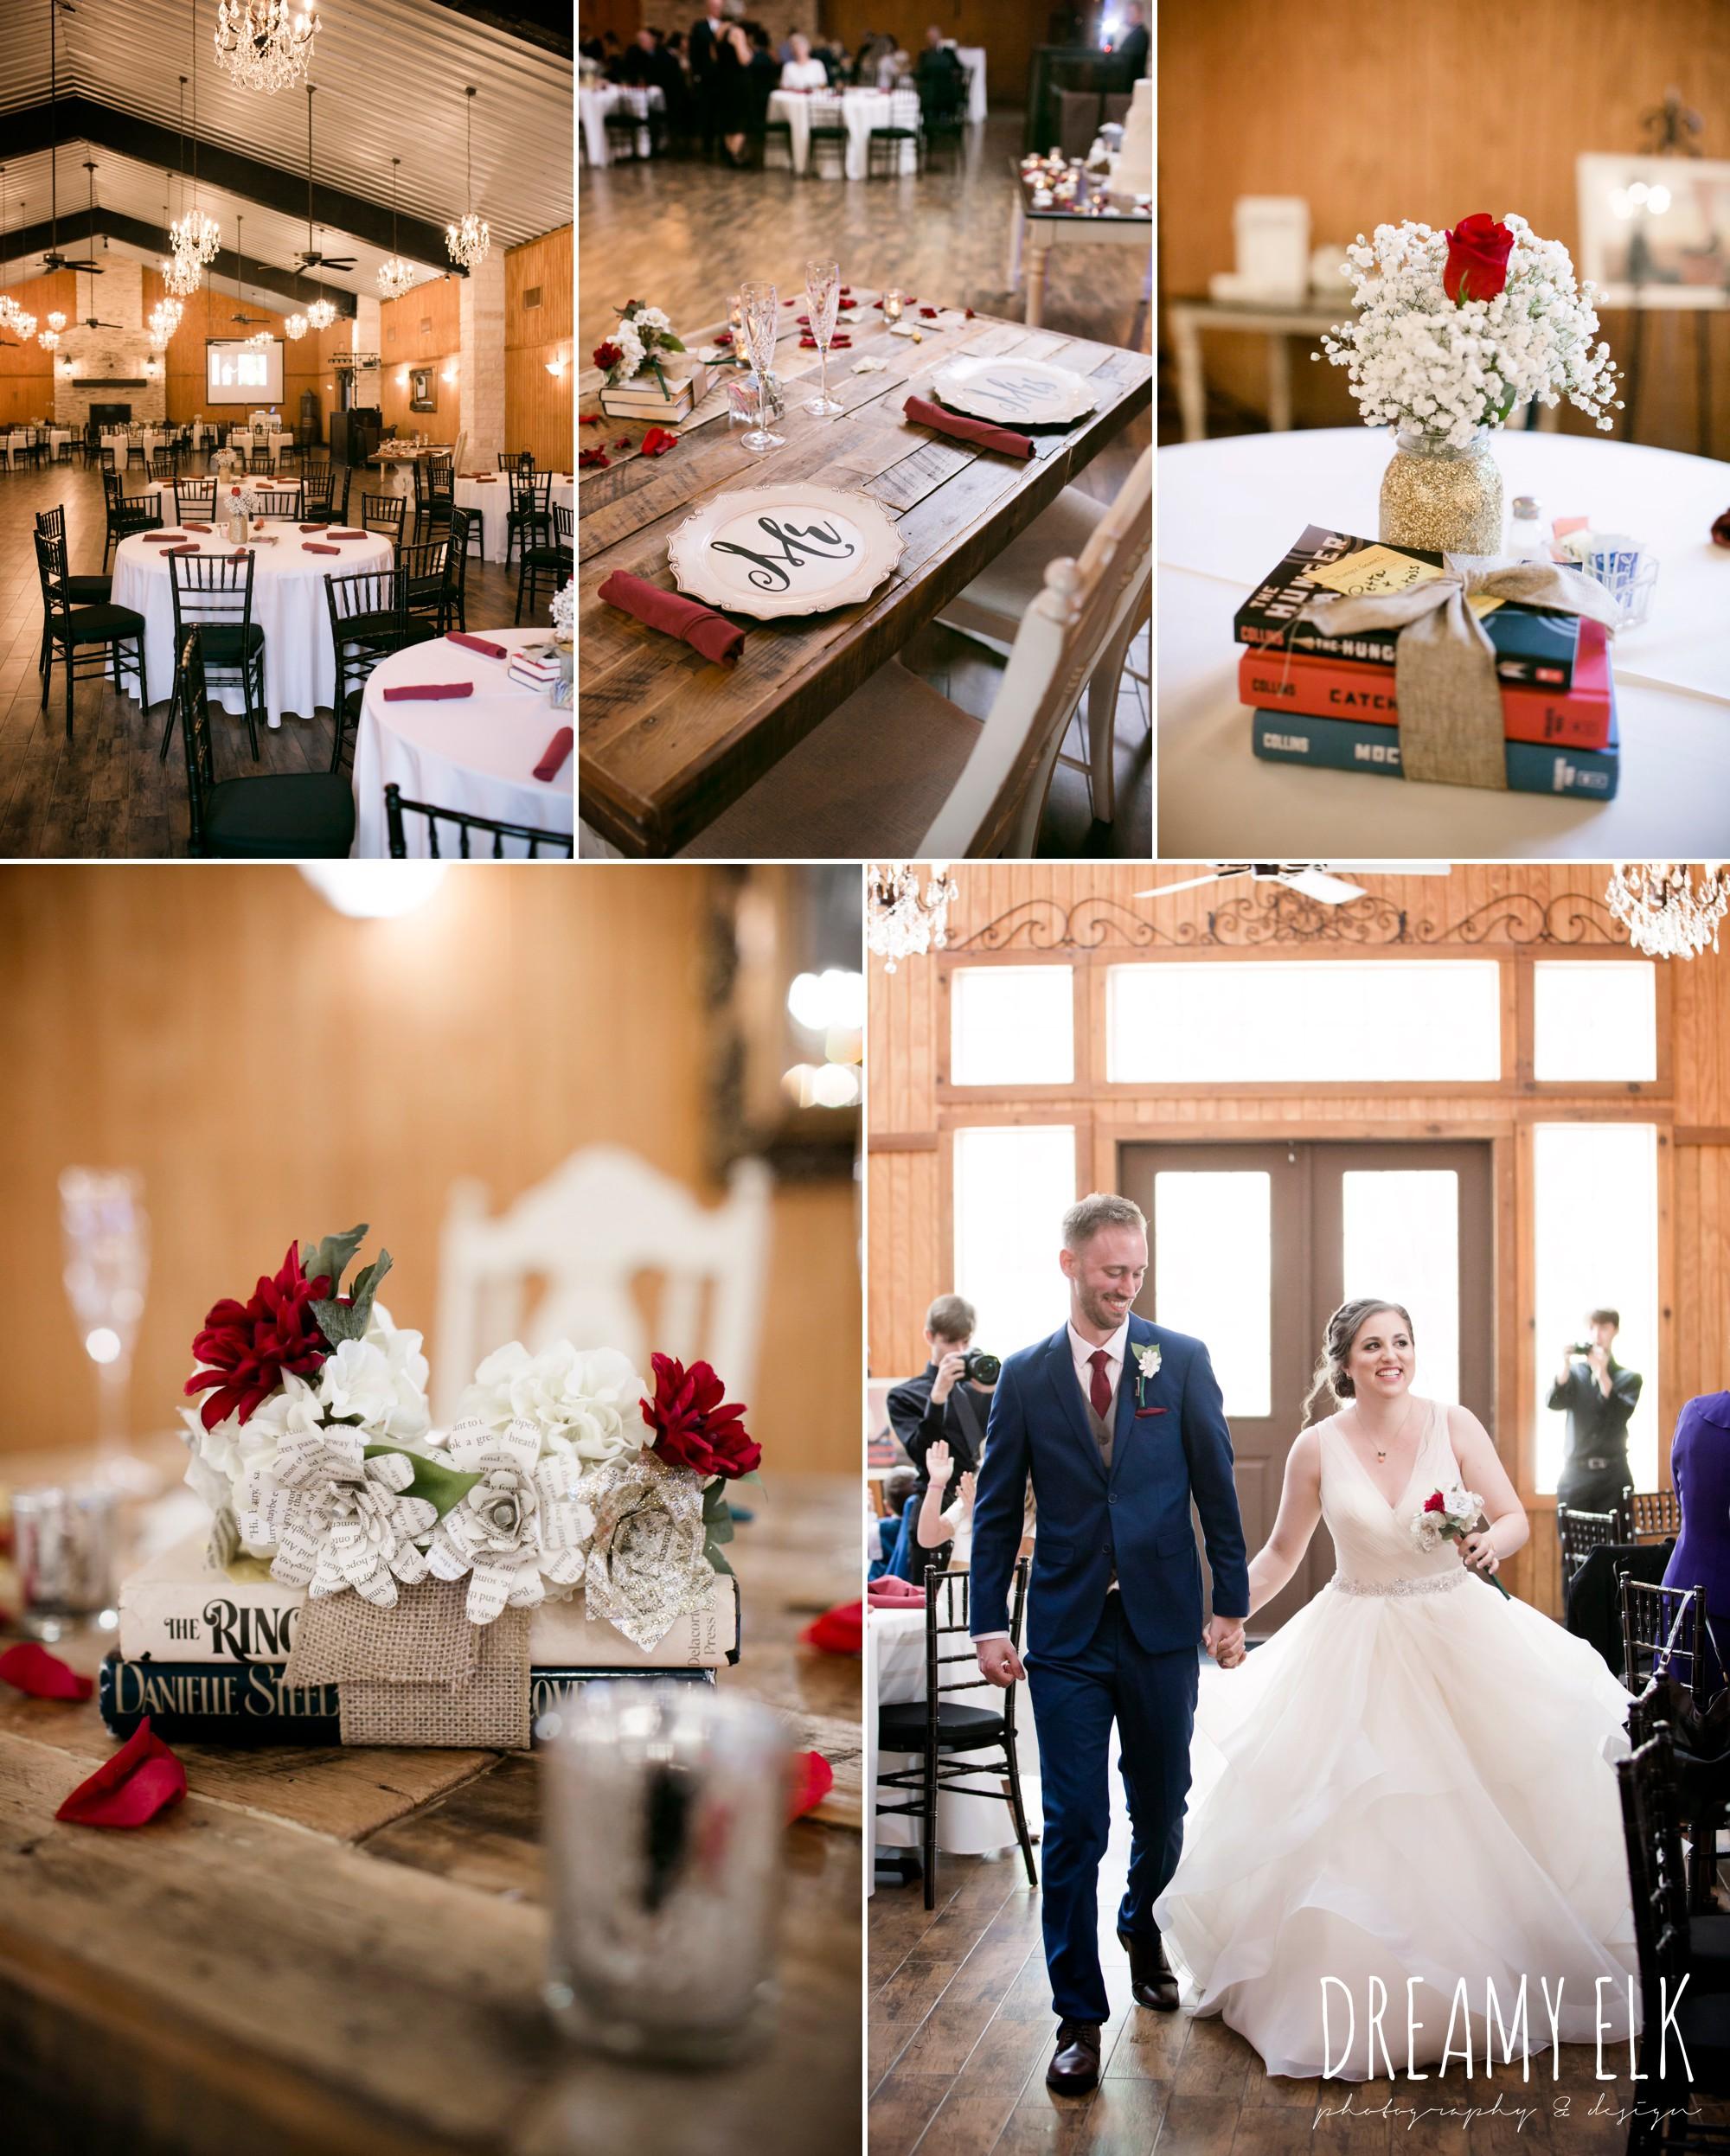 book table centerpieces, fall wedding, gold and navy wedding photo, ashelynn manor, austin texas wedding photographer, dreamy elk photography and design, emily ross